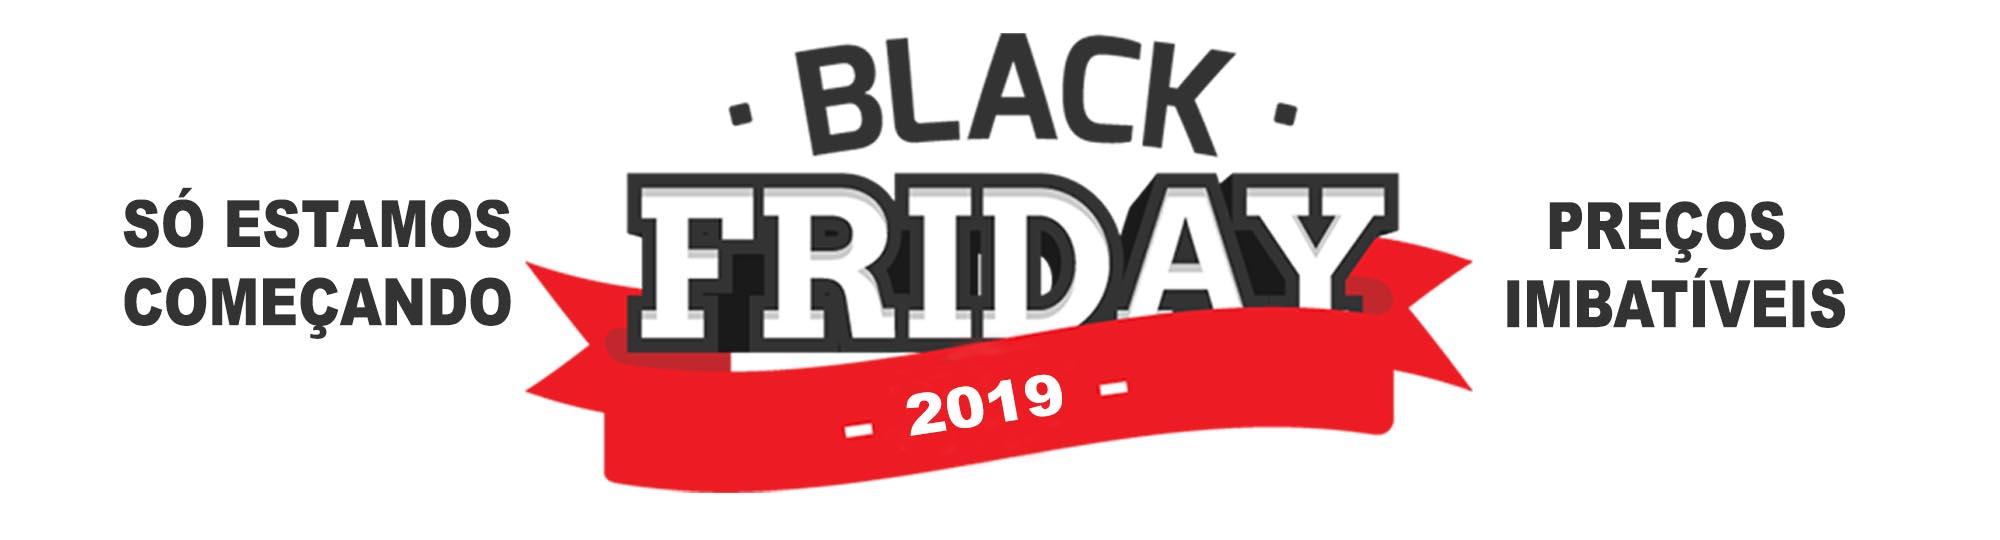 Esquenta Black Friday 2019